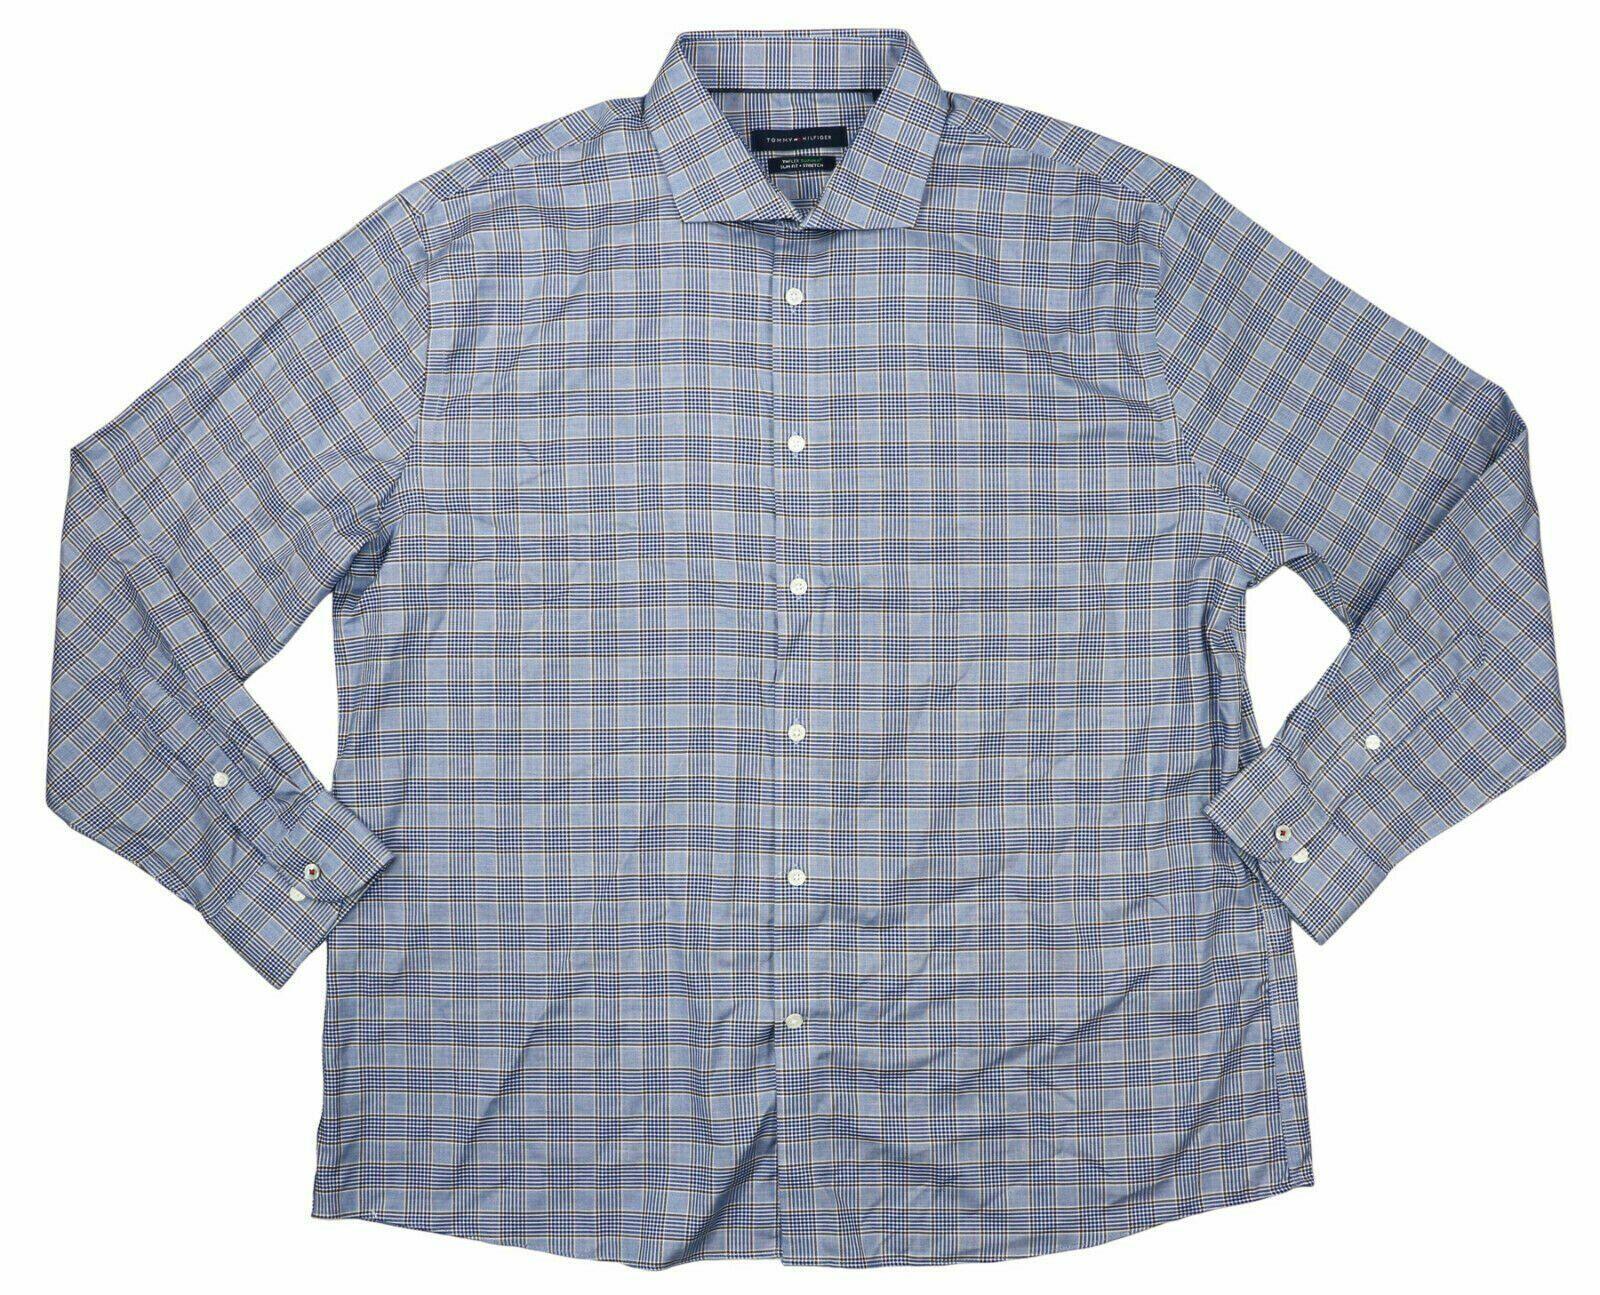 Tommy Hilfiger Men Dress Shirt Blue Size 16 Slim Fitted Button Down